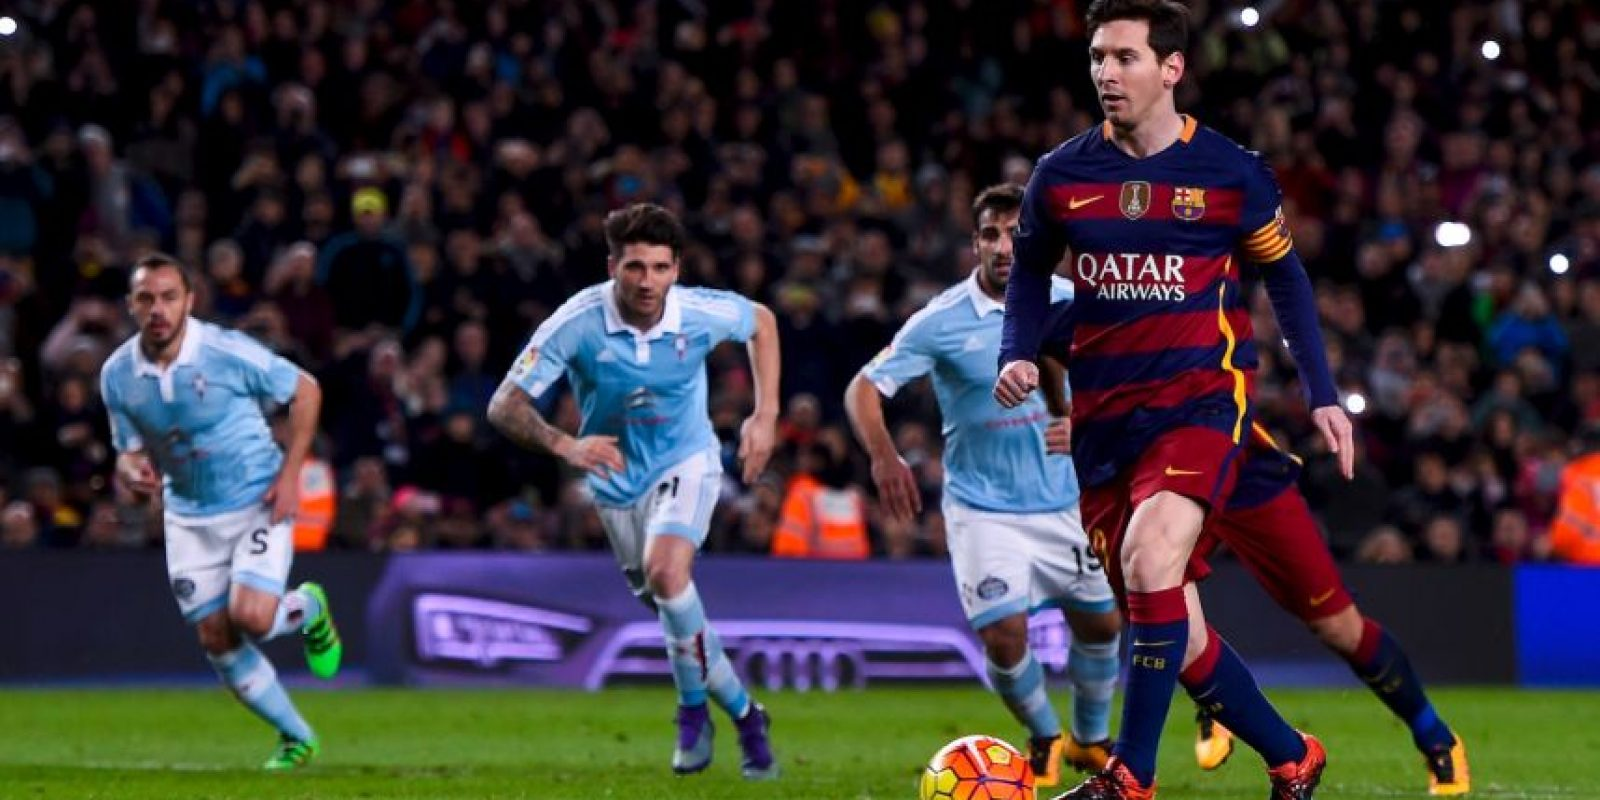 El penal indirecto de Lionel Messi y Luis Suárez se viralizó Foto:Getty Images